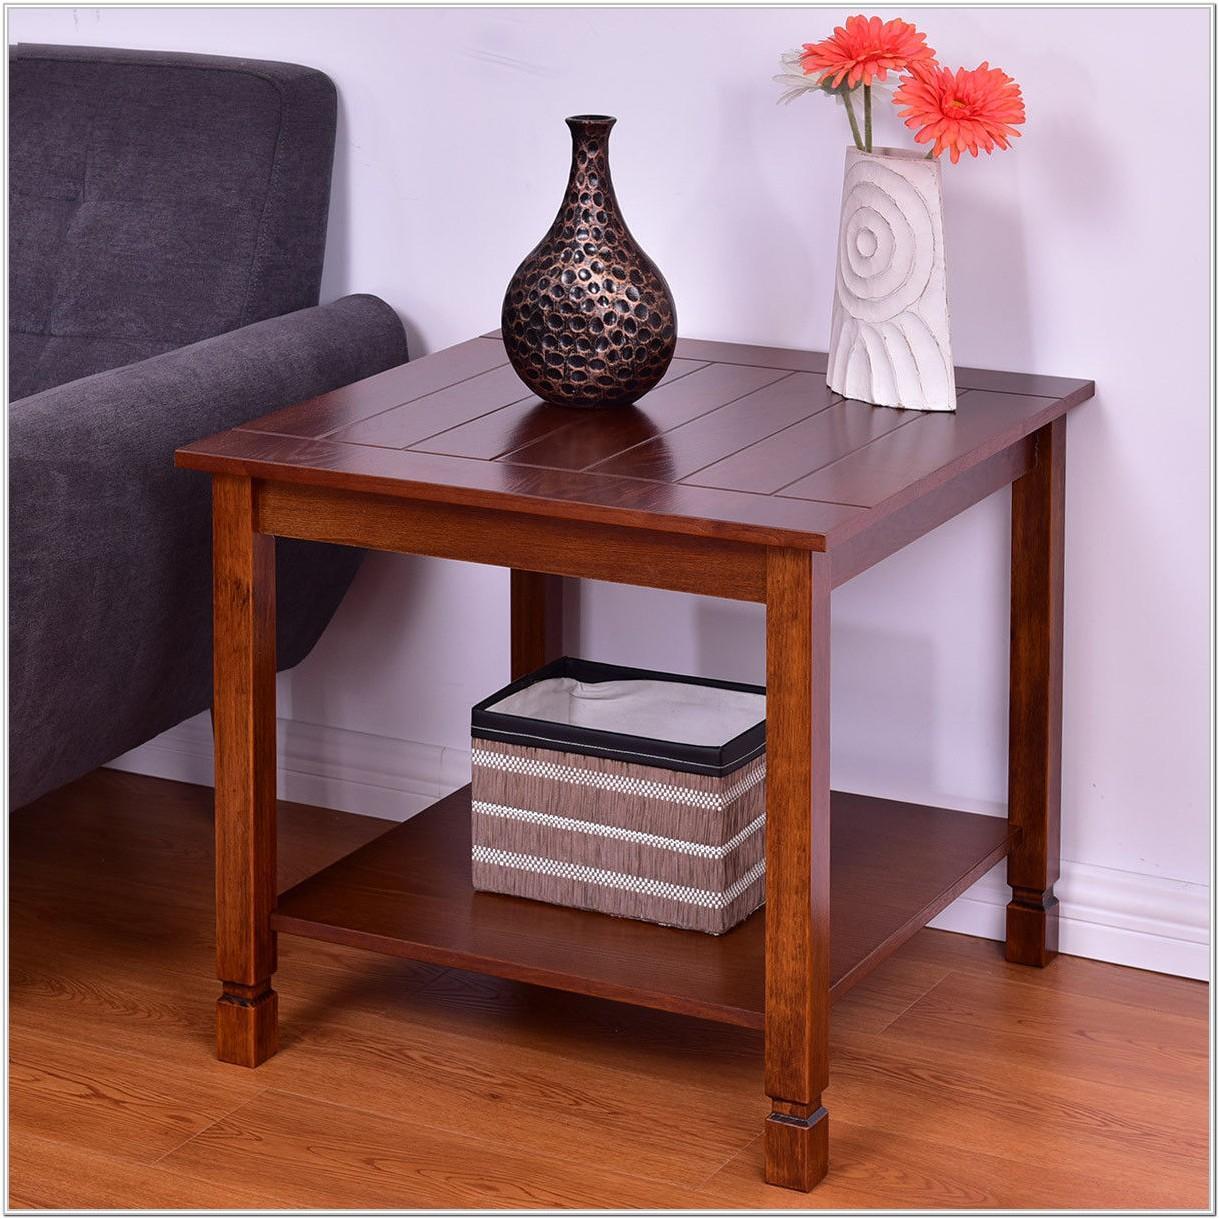 Living Room Furniture Stands